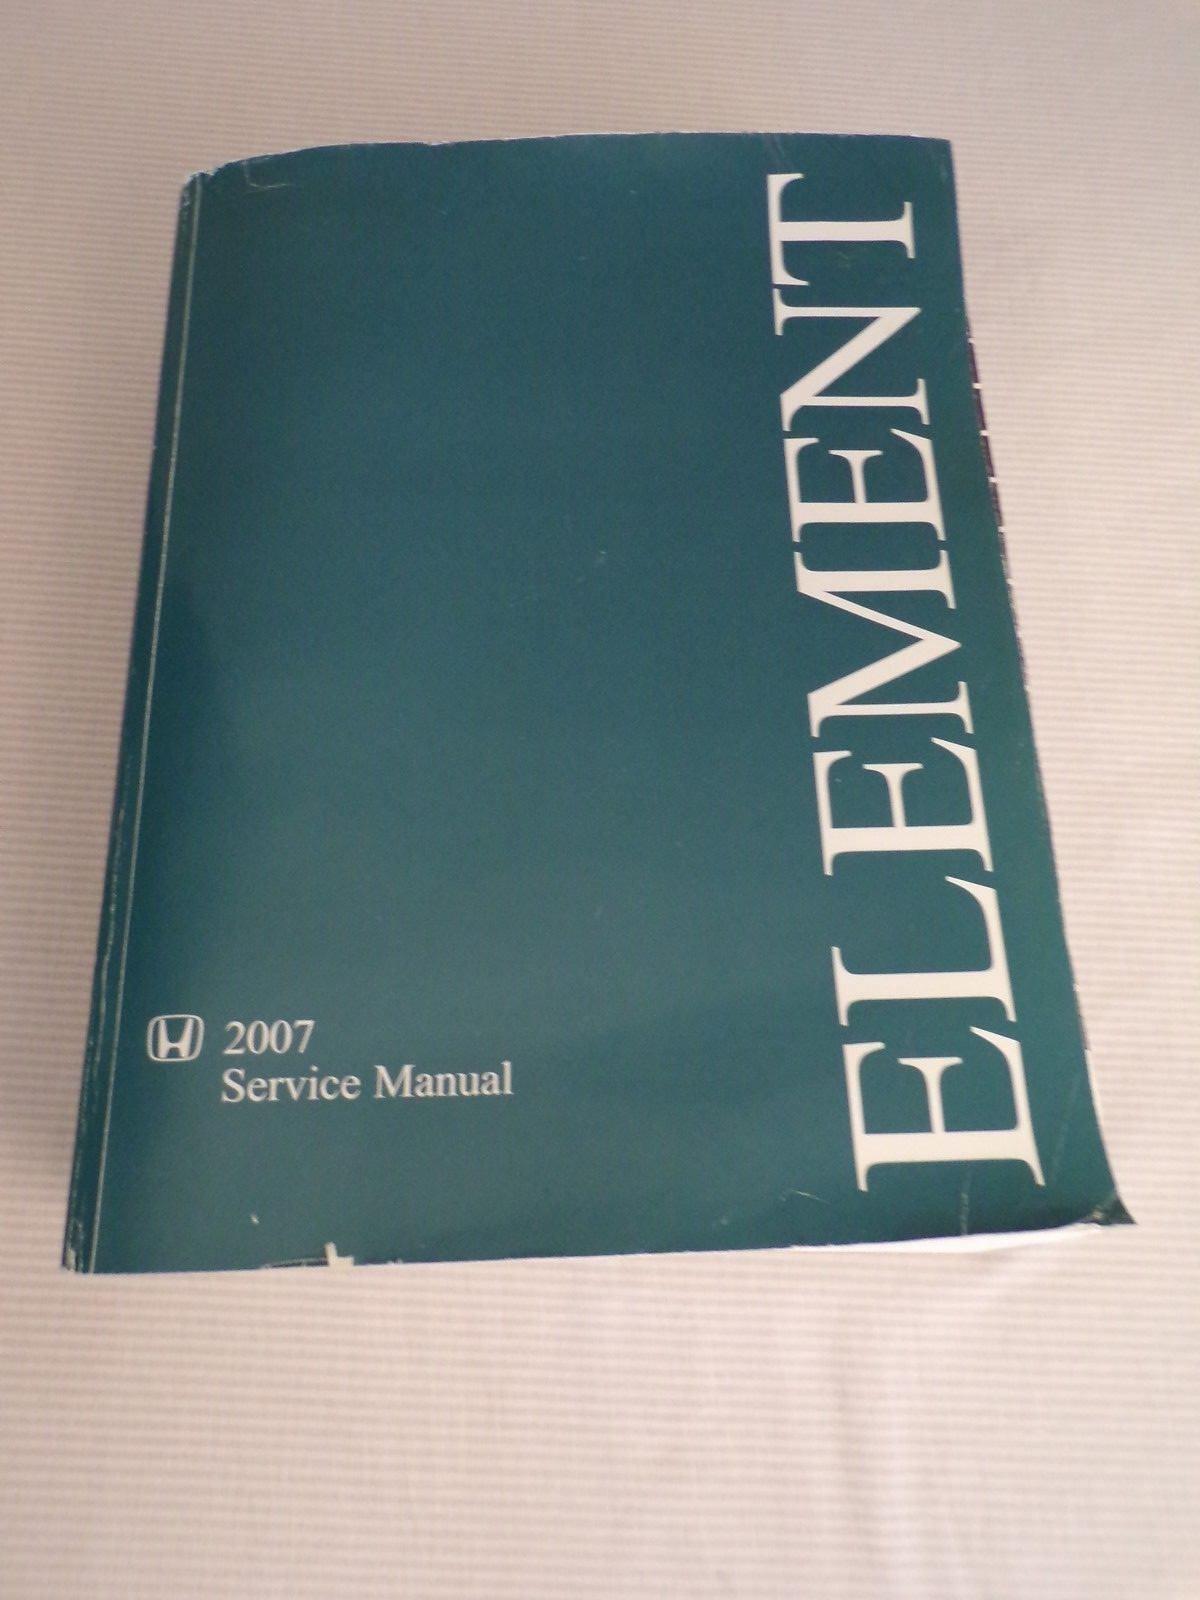 2007 honda element service manual paperback ebay rh ebay com Honda Element Parts Manual 2010 honda element service manual